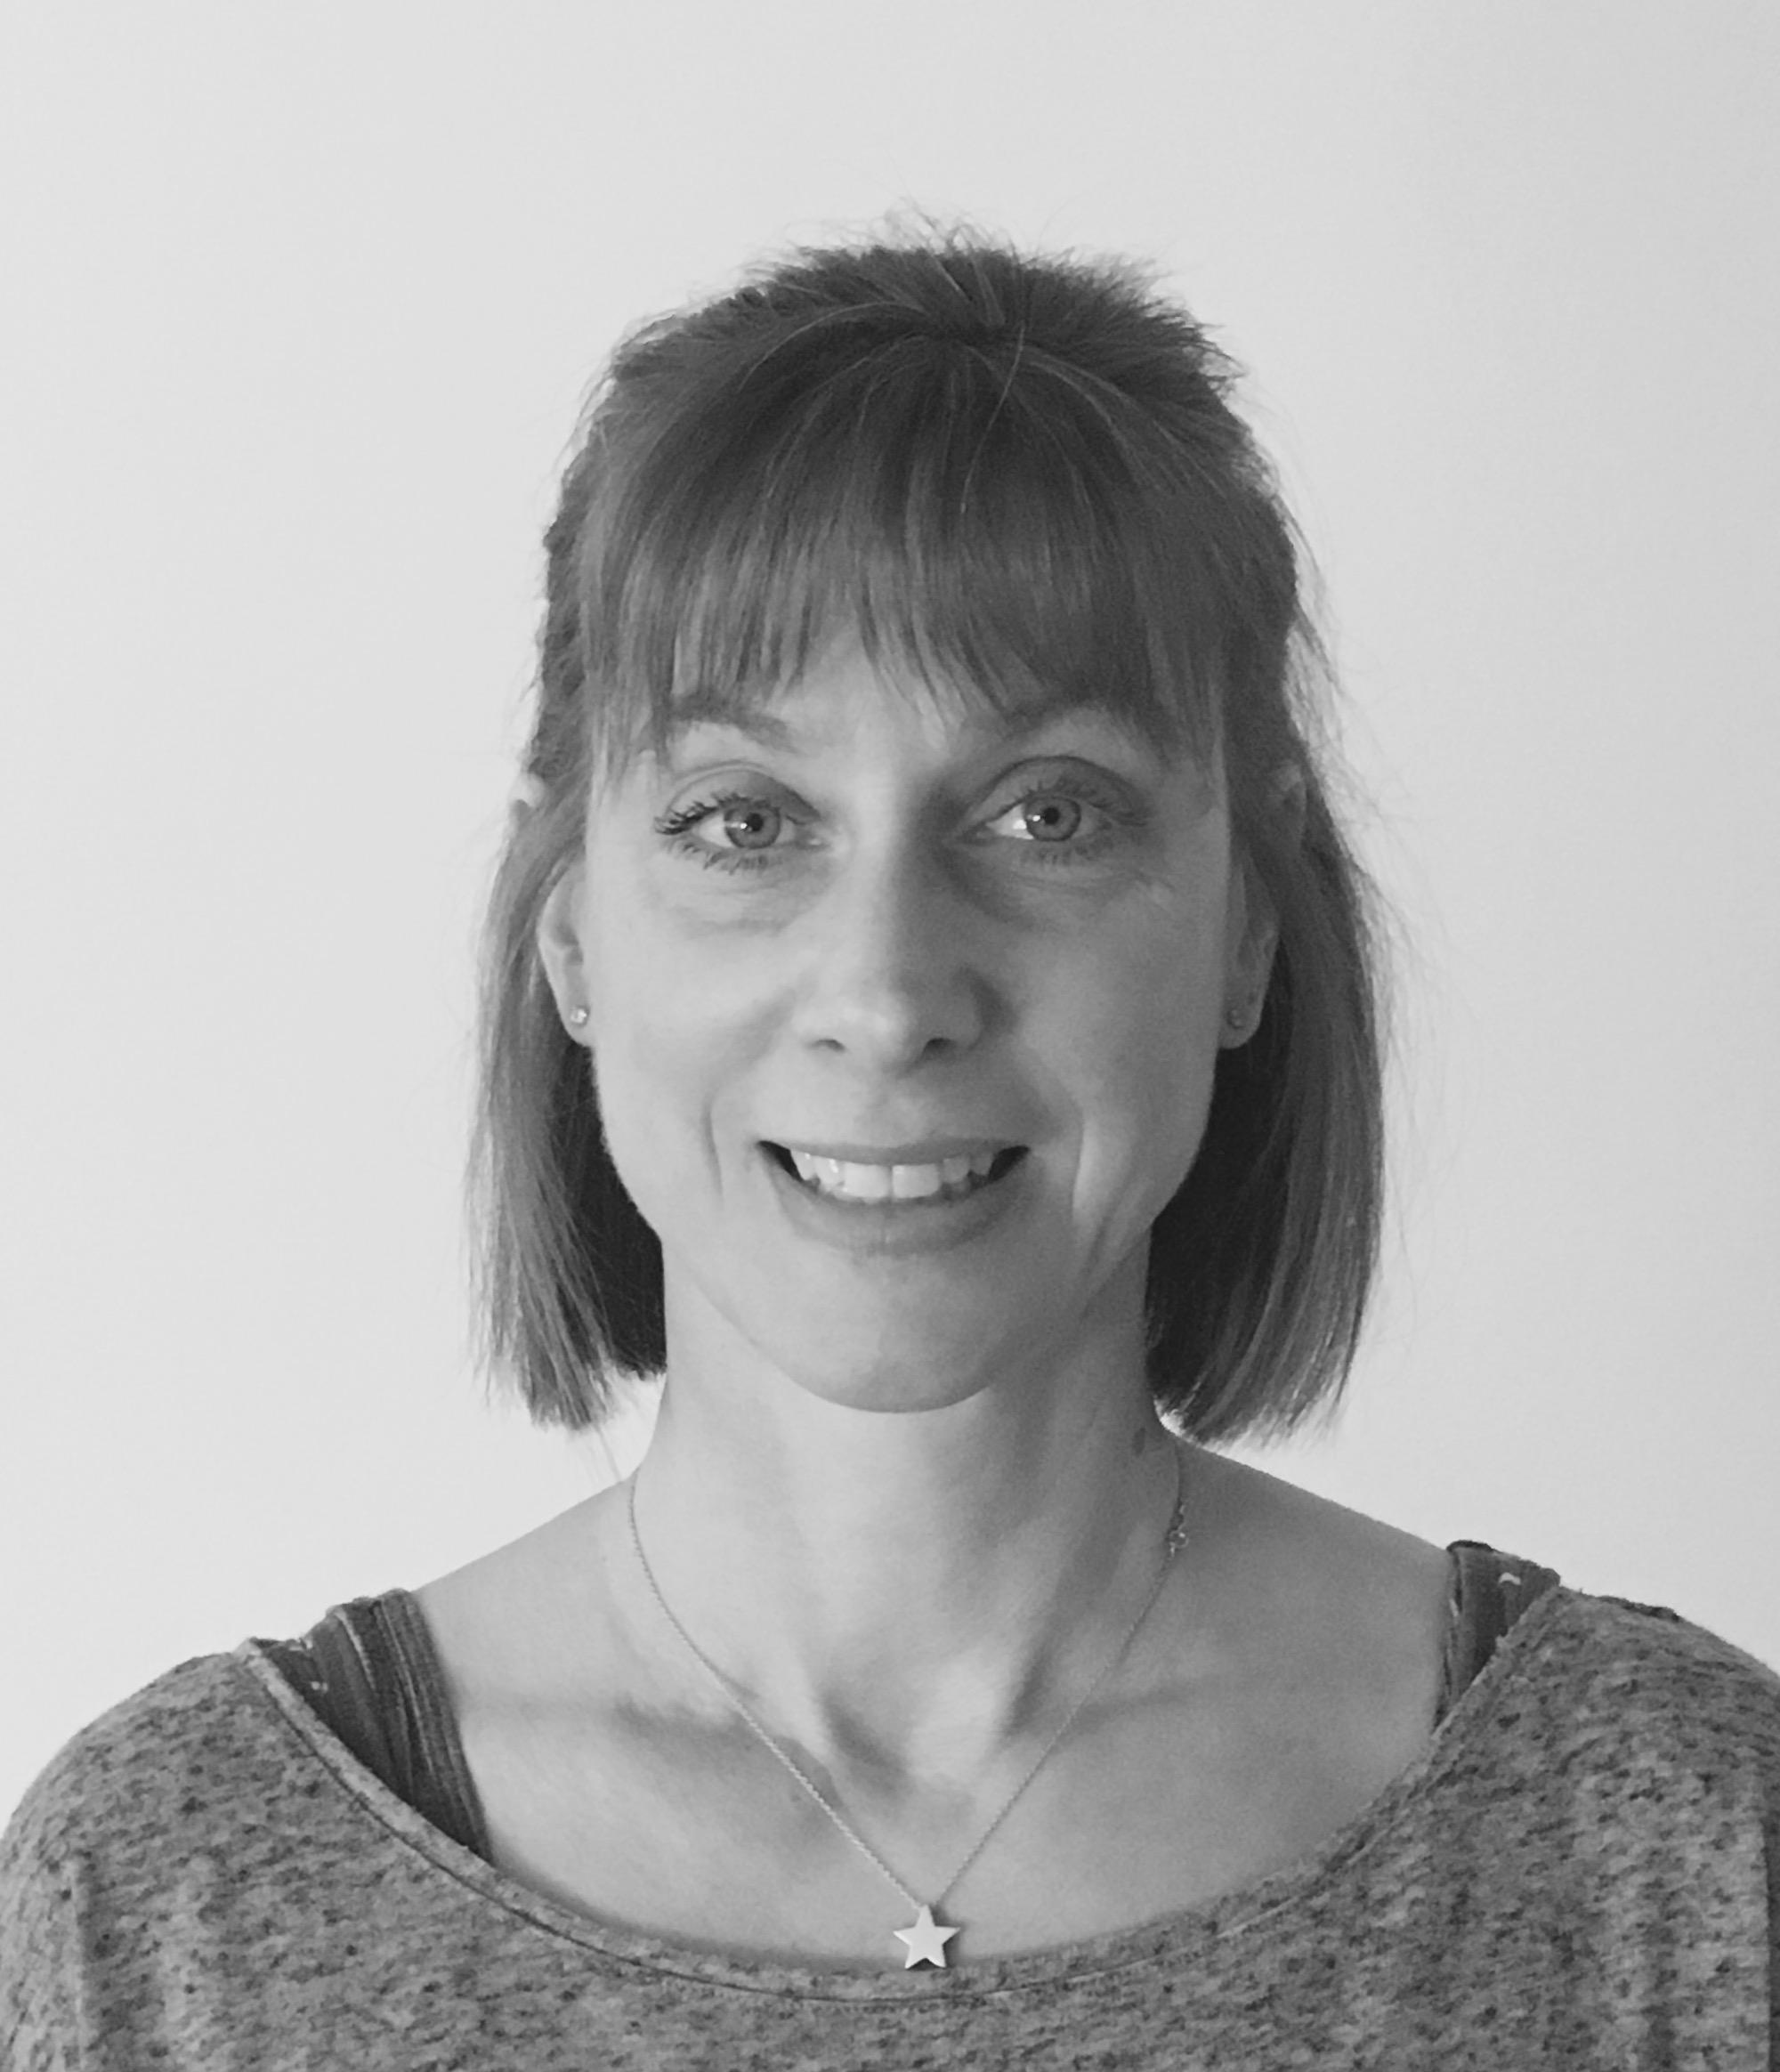 Alison Boden